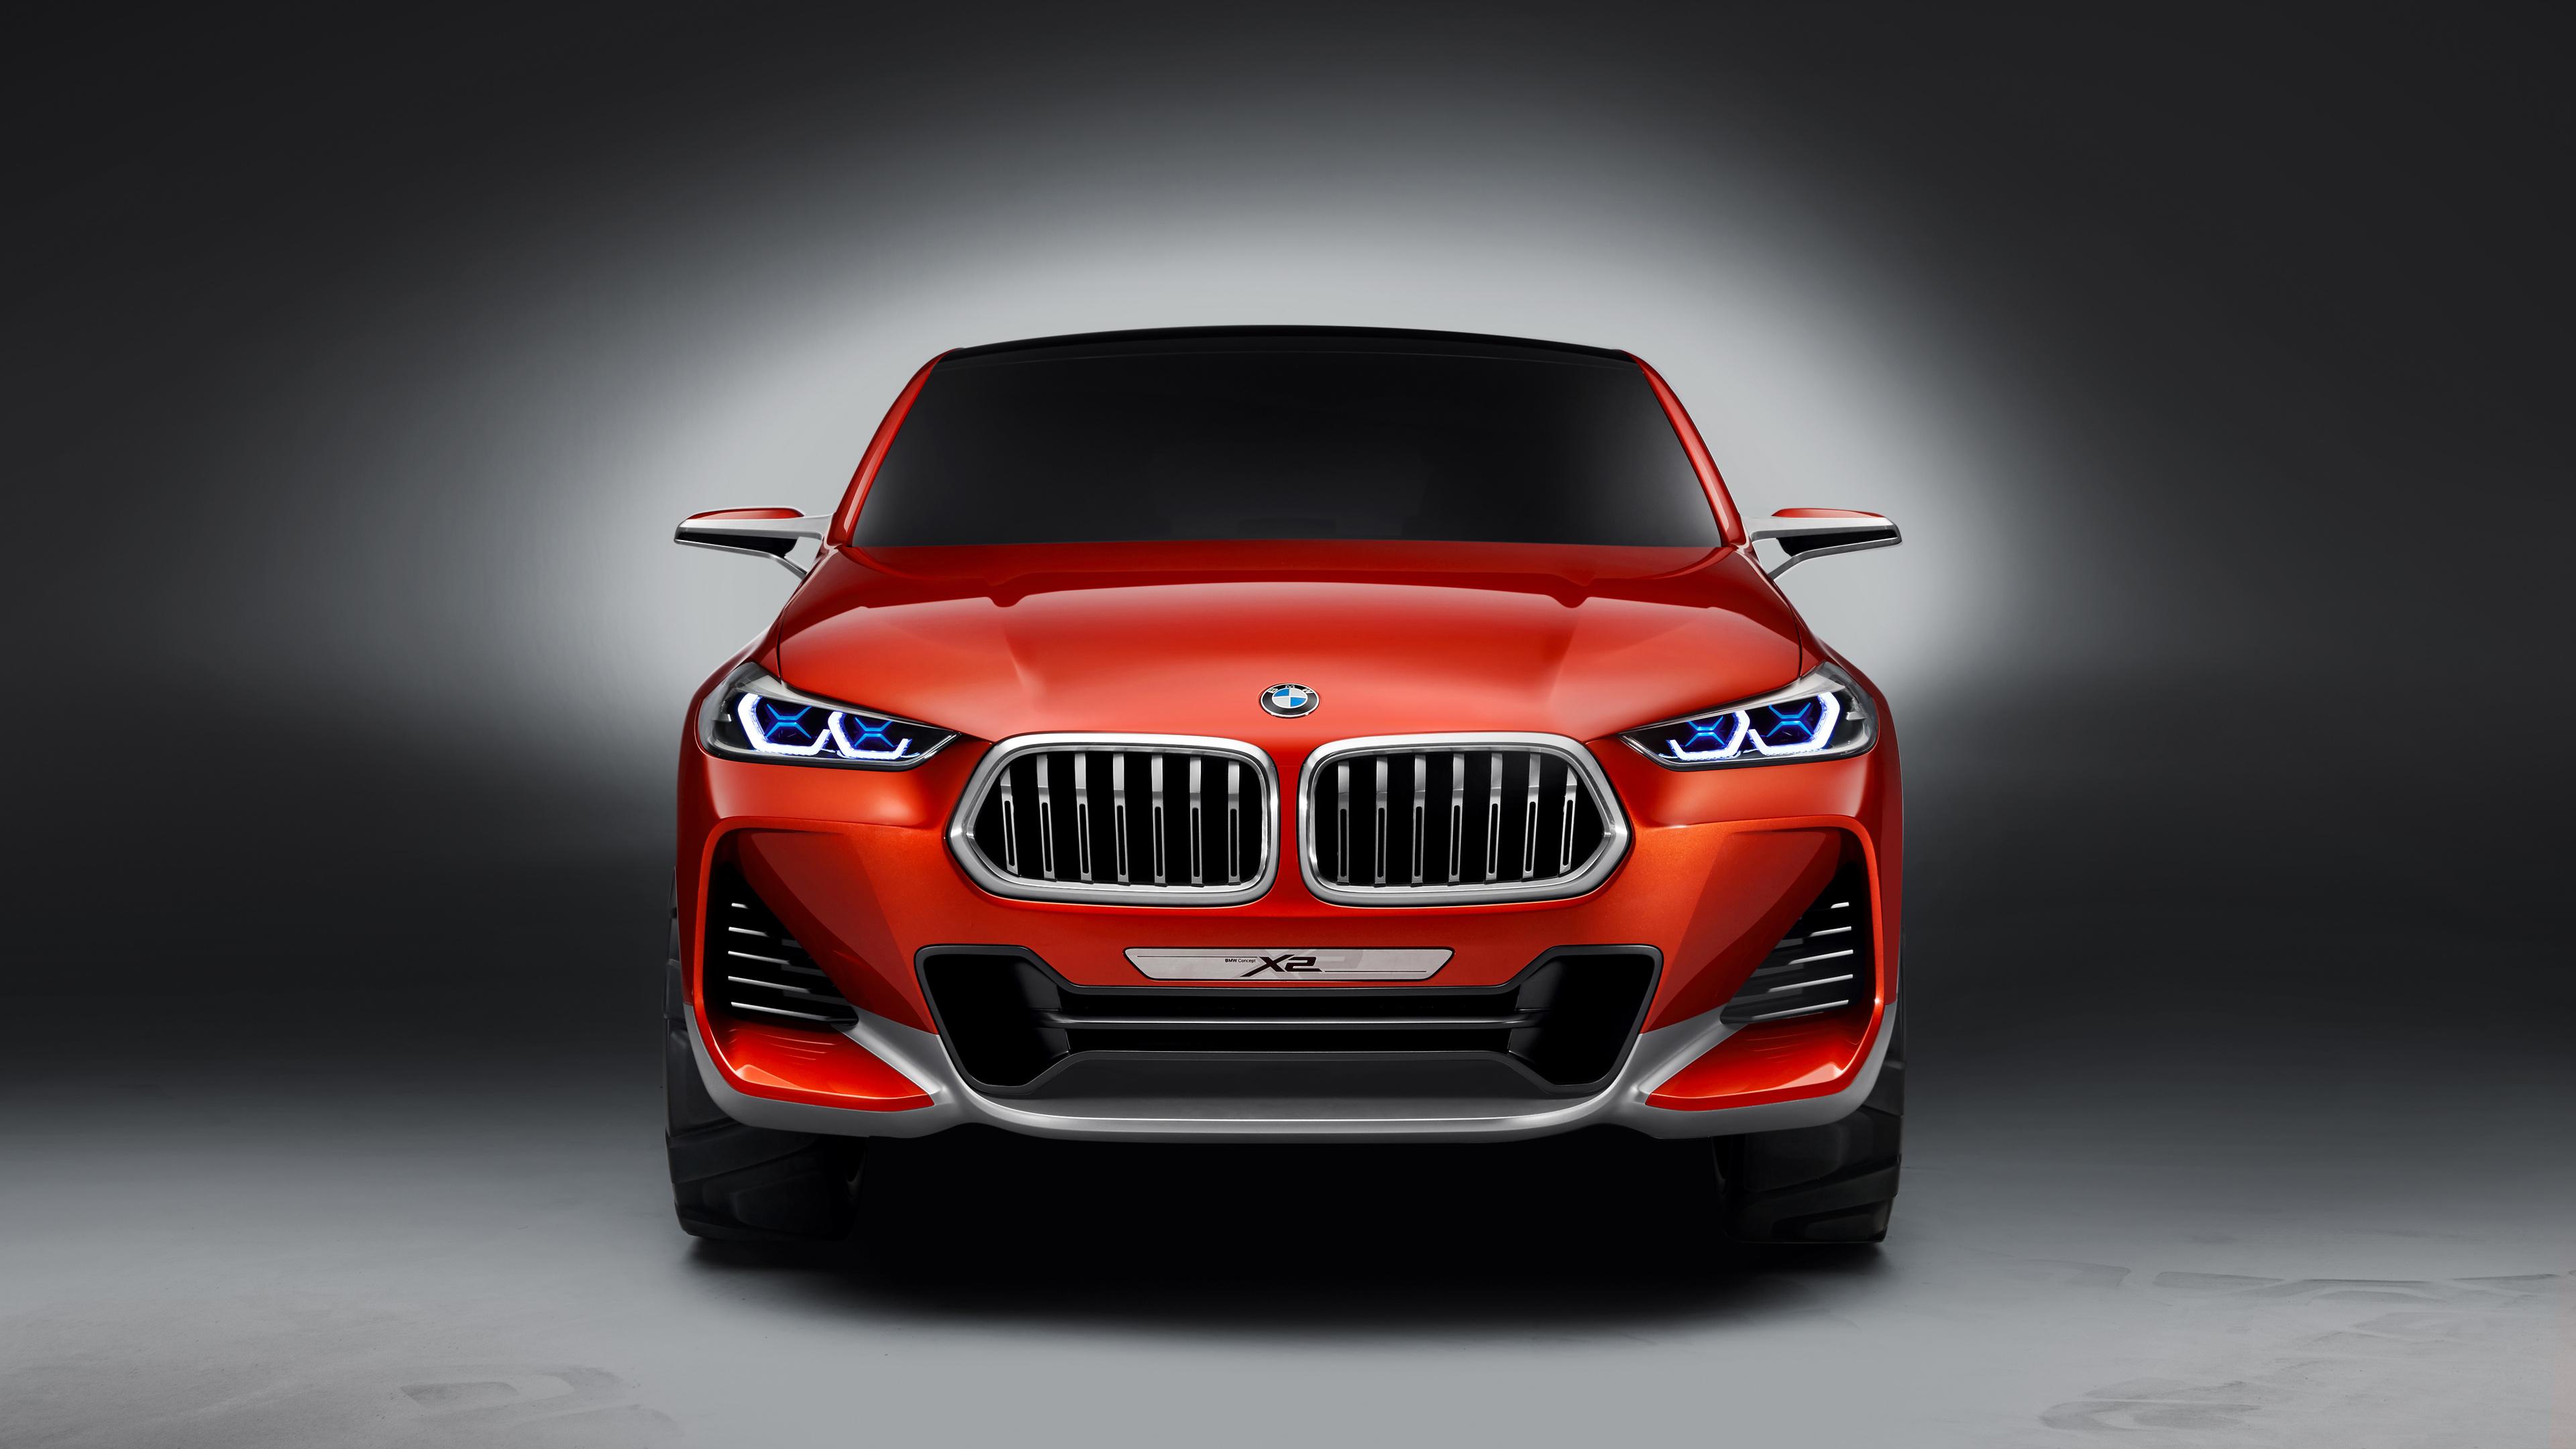 2018 bmw x2 concept car 1539104948 - 2018 Bmw X2 Concept Car - hd-wallpapers, cars wallpapers, bmw x2 wallpapers, bmw wallpapers, 4k-wallpapers, 2018 cars wallpapers